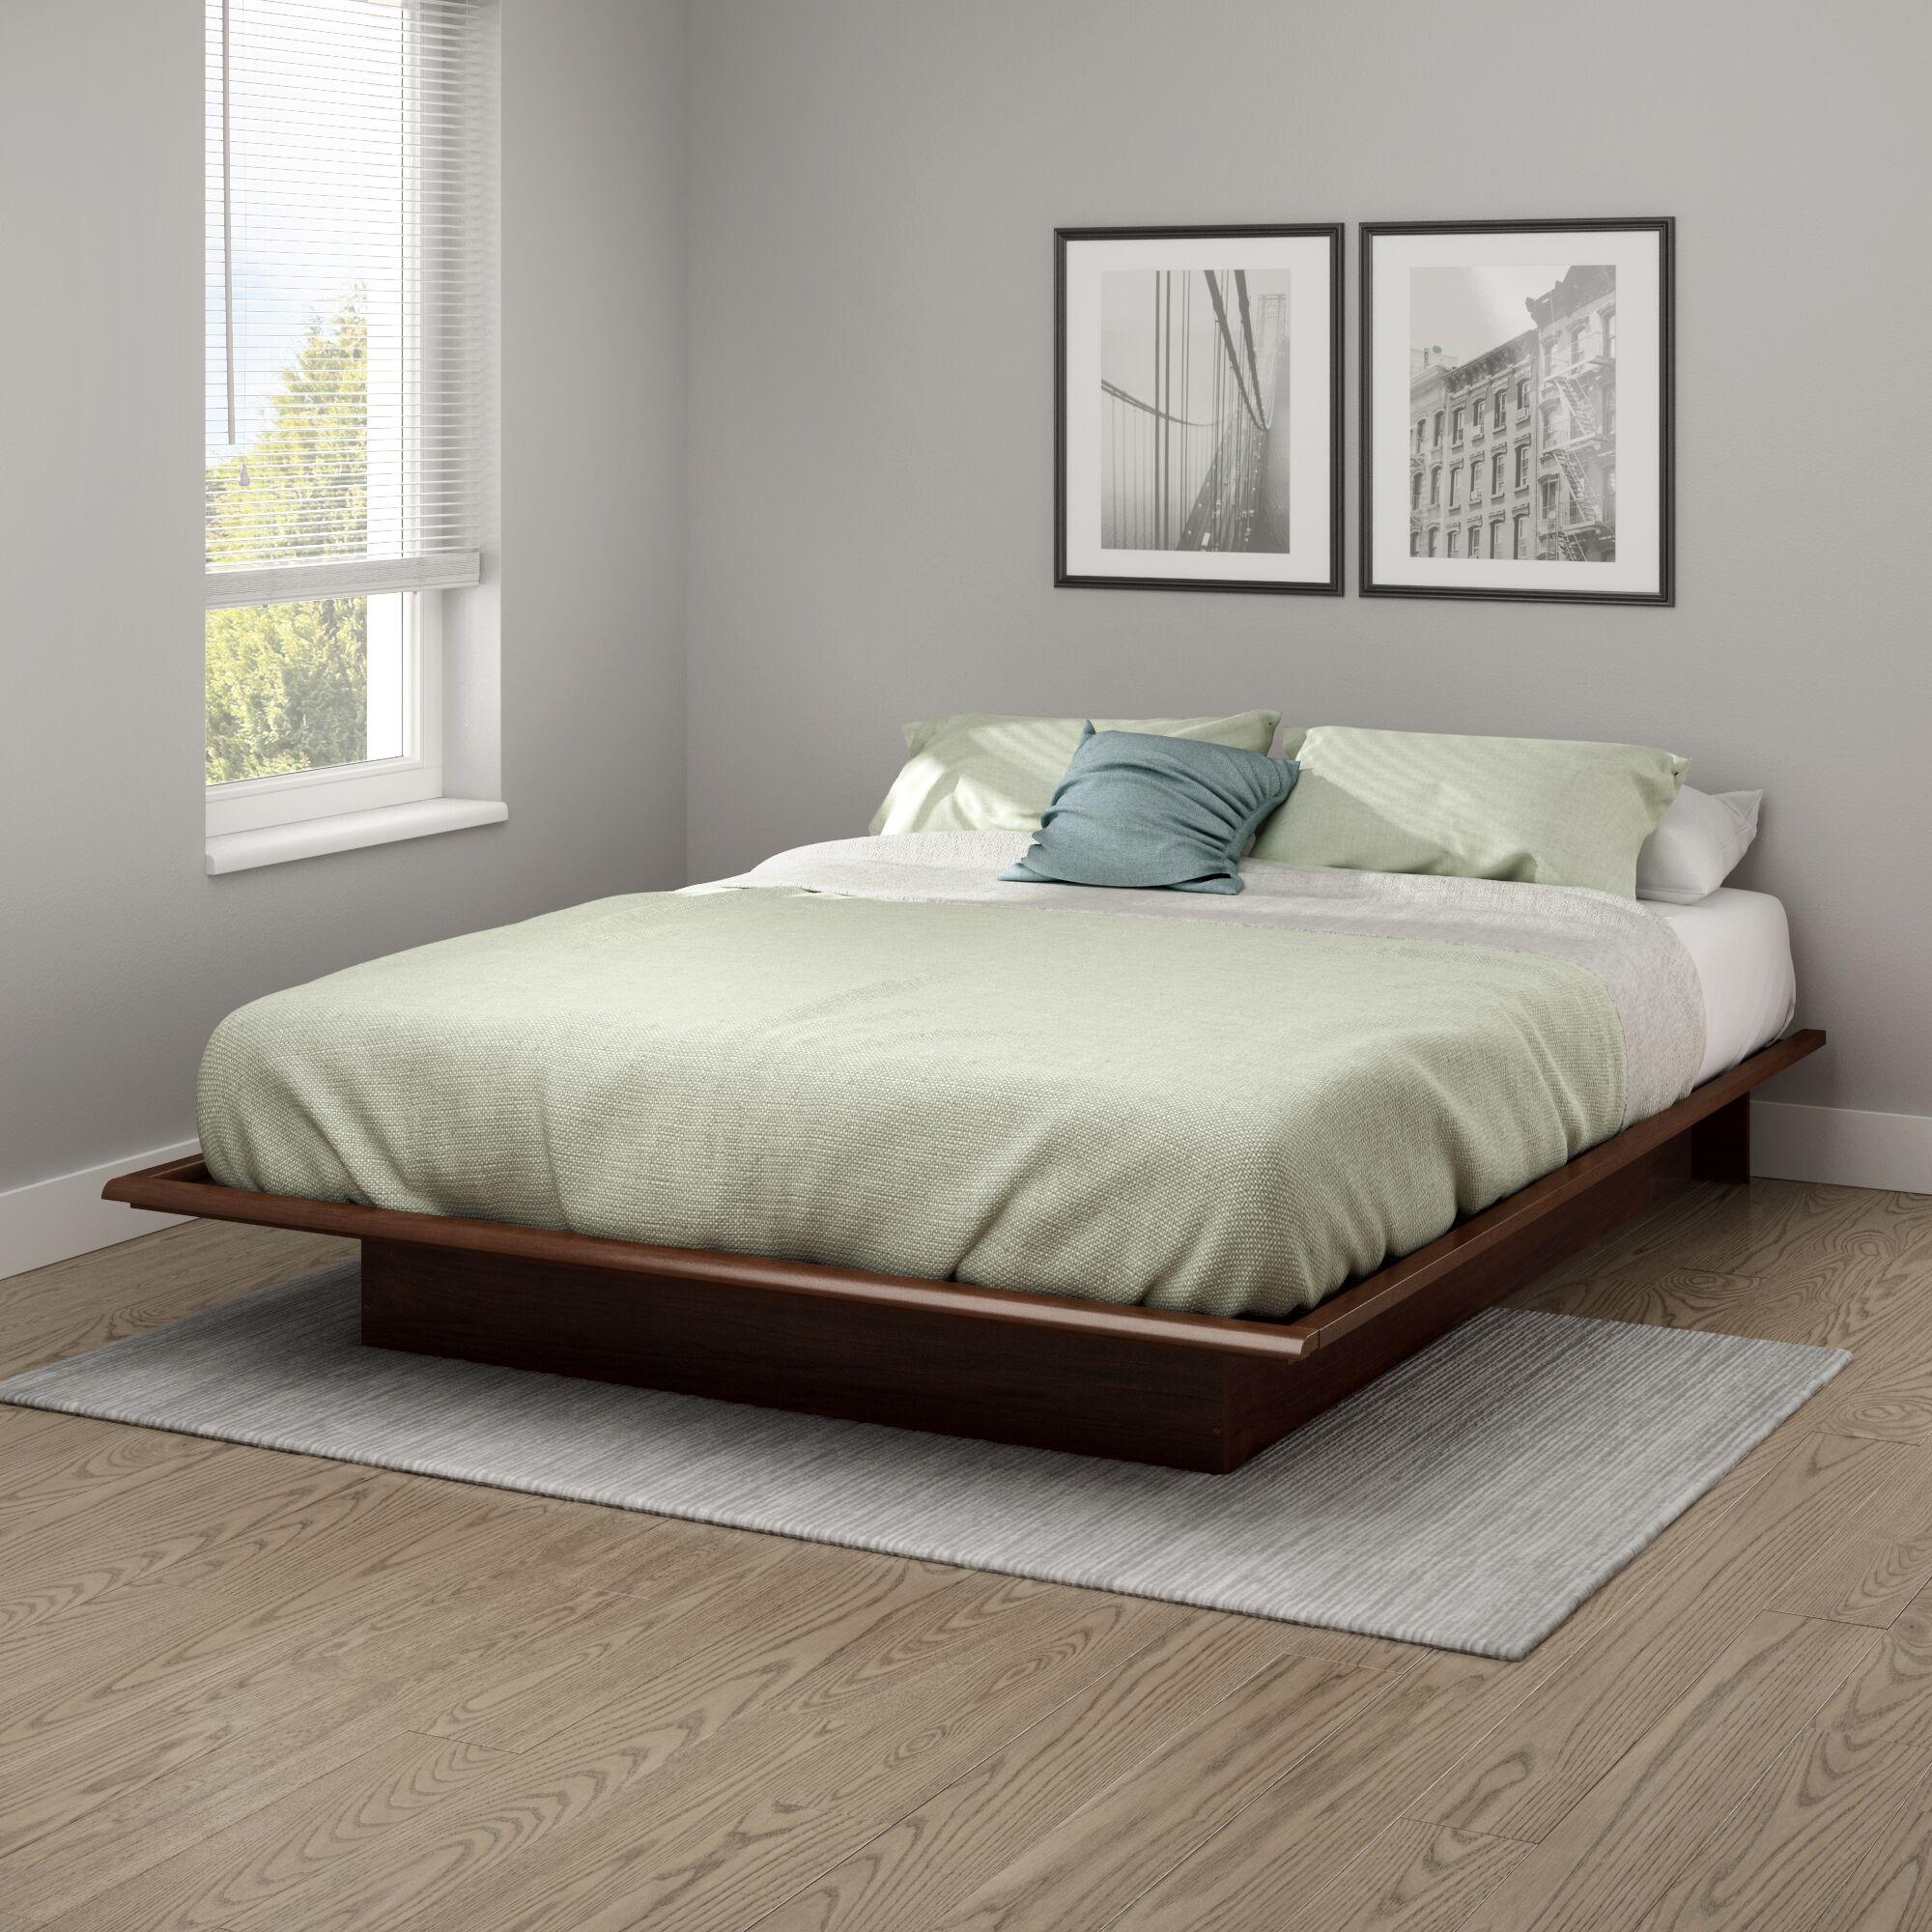 Step One Platform Bed Size: Queen, Color: Sumptuous Cherry